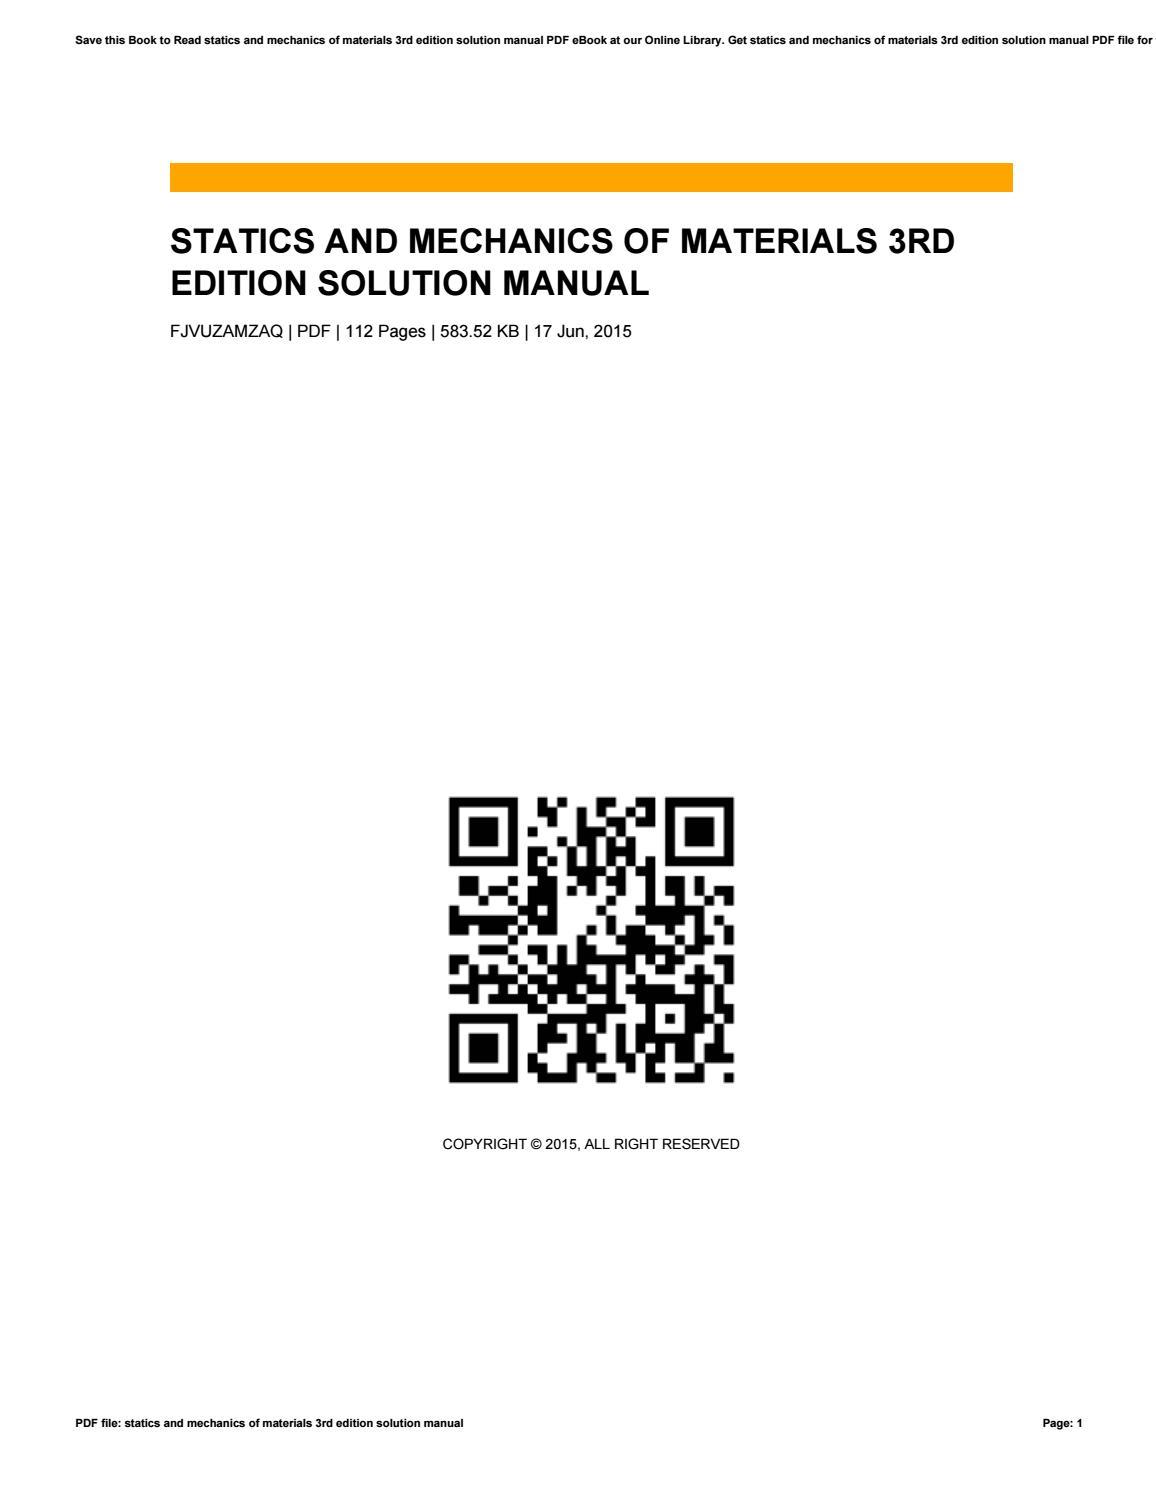 Statics And Mechanics Of Materials Pdf